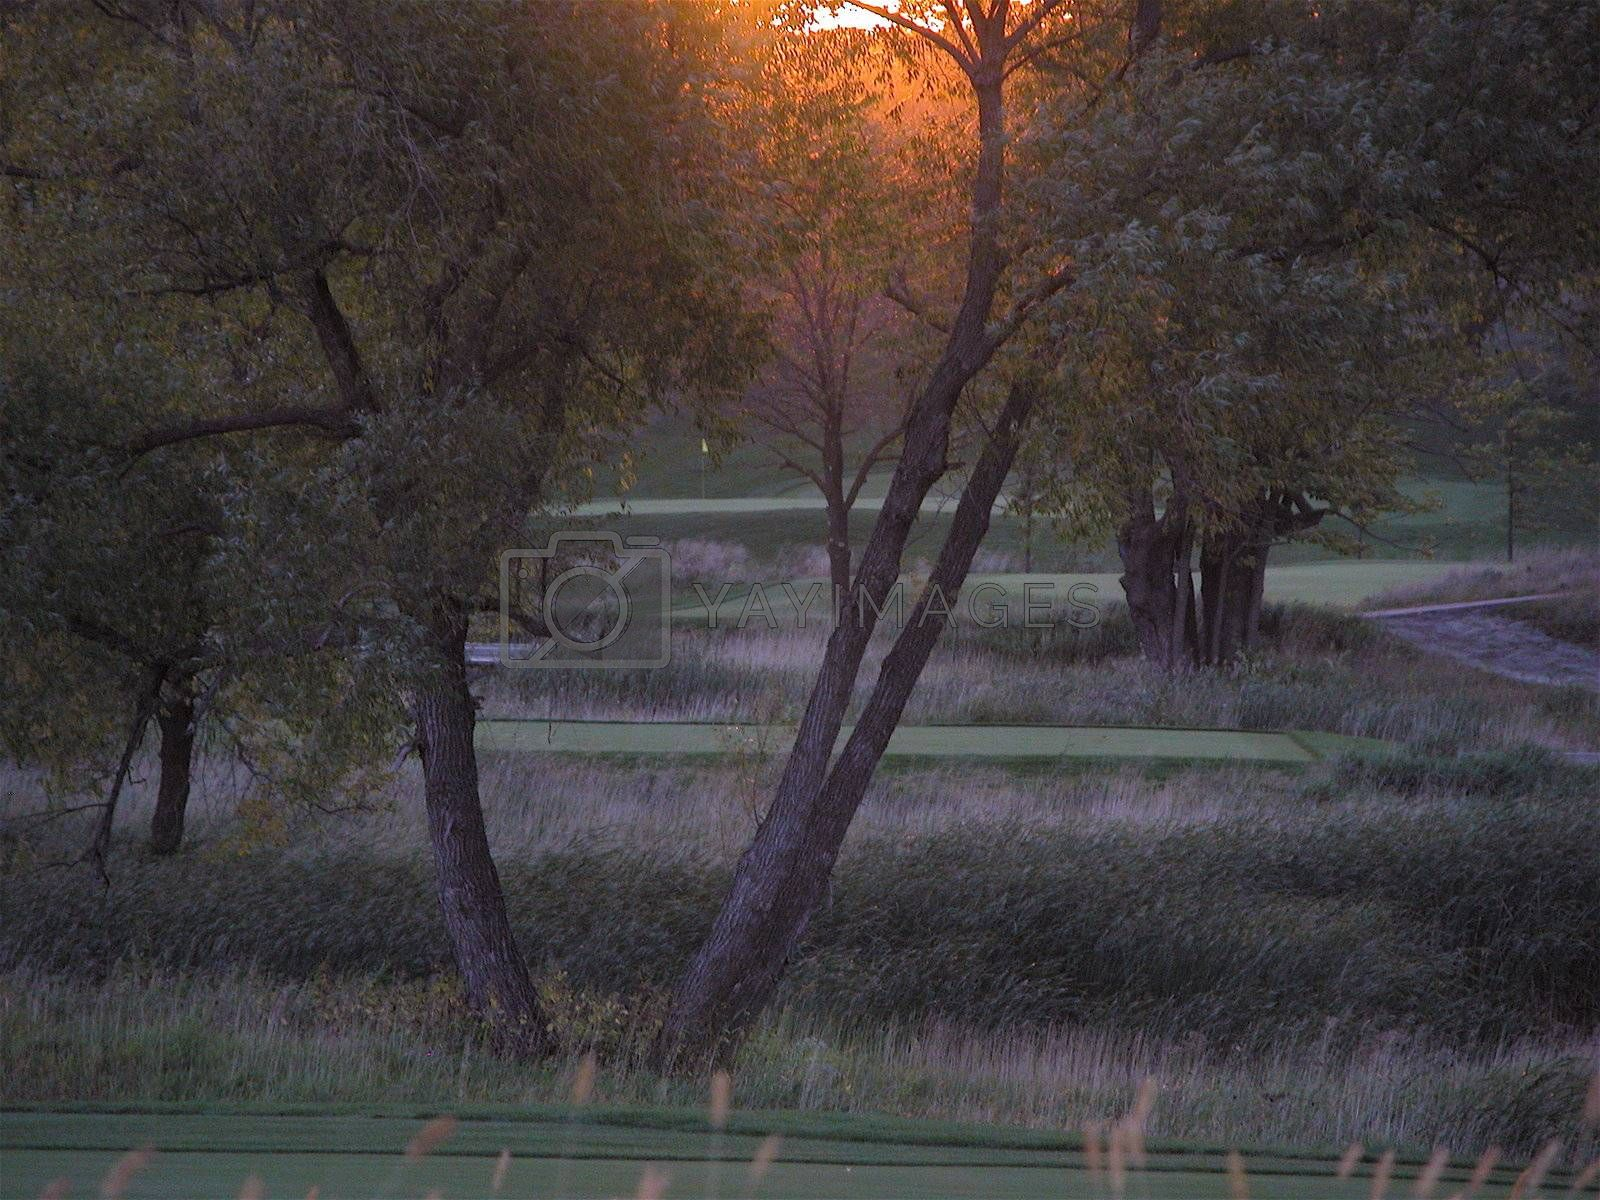 Golf green and tee box peeking though trees as sun is setting